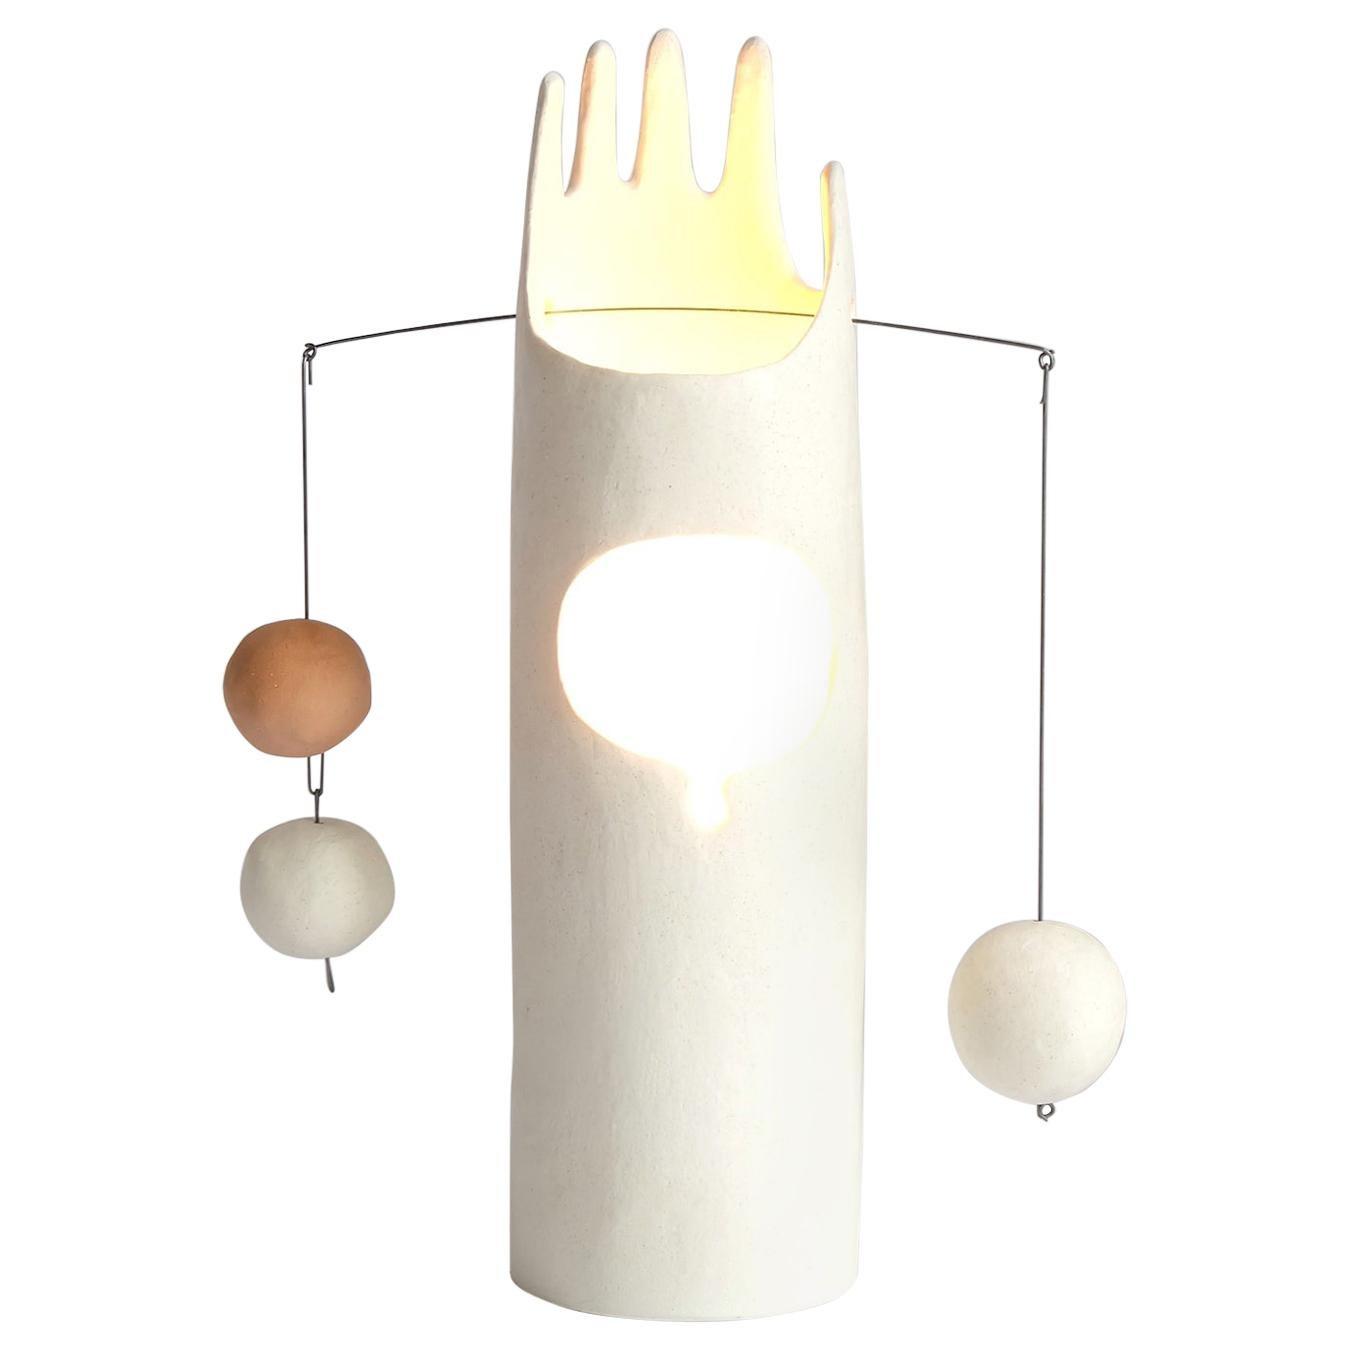 Neco, Contemporary Sculptural Hand-Built Ceramic Table Lamp in Matte White